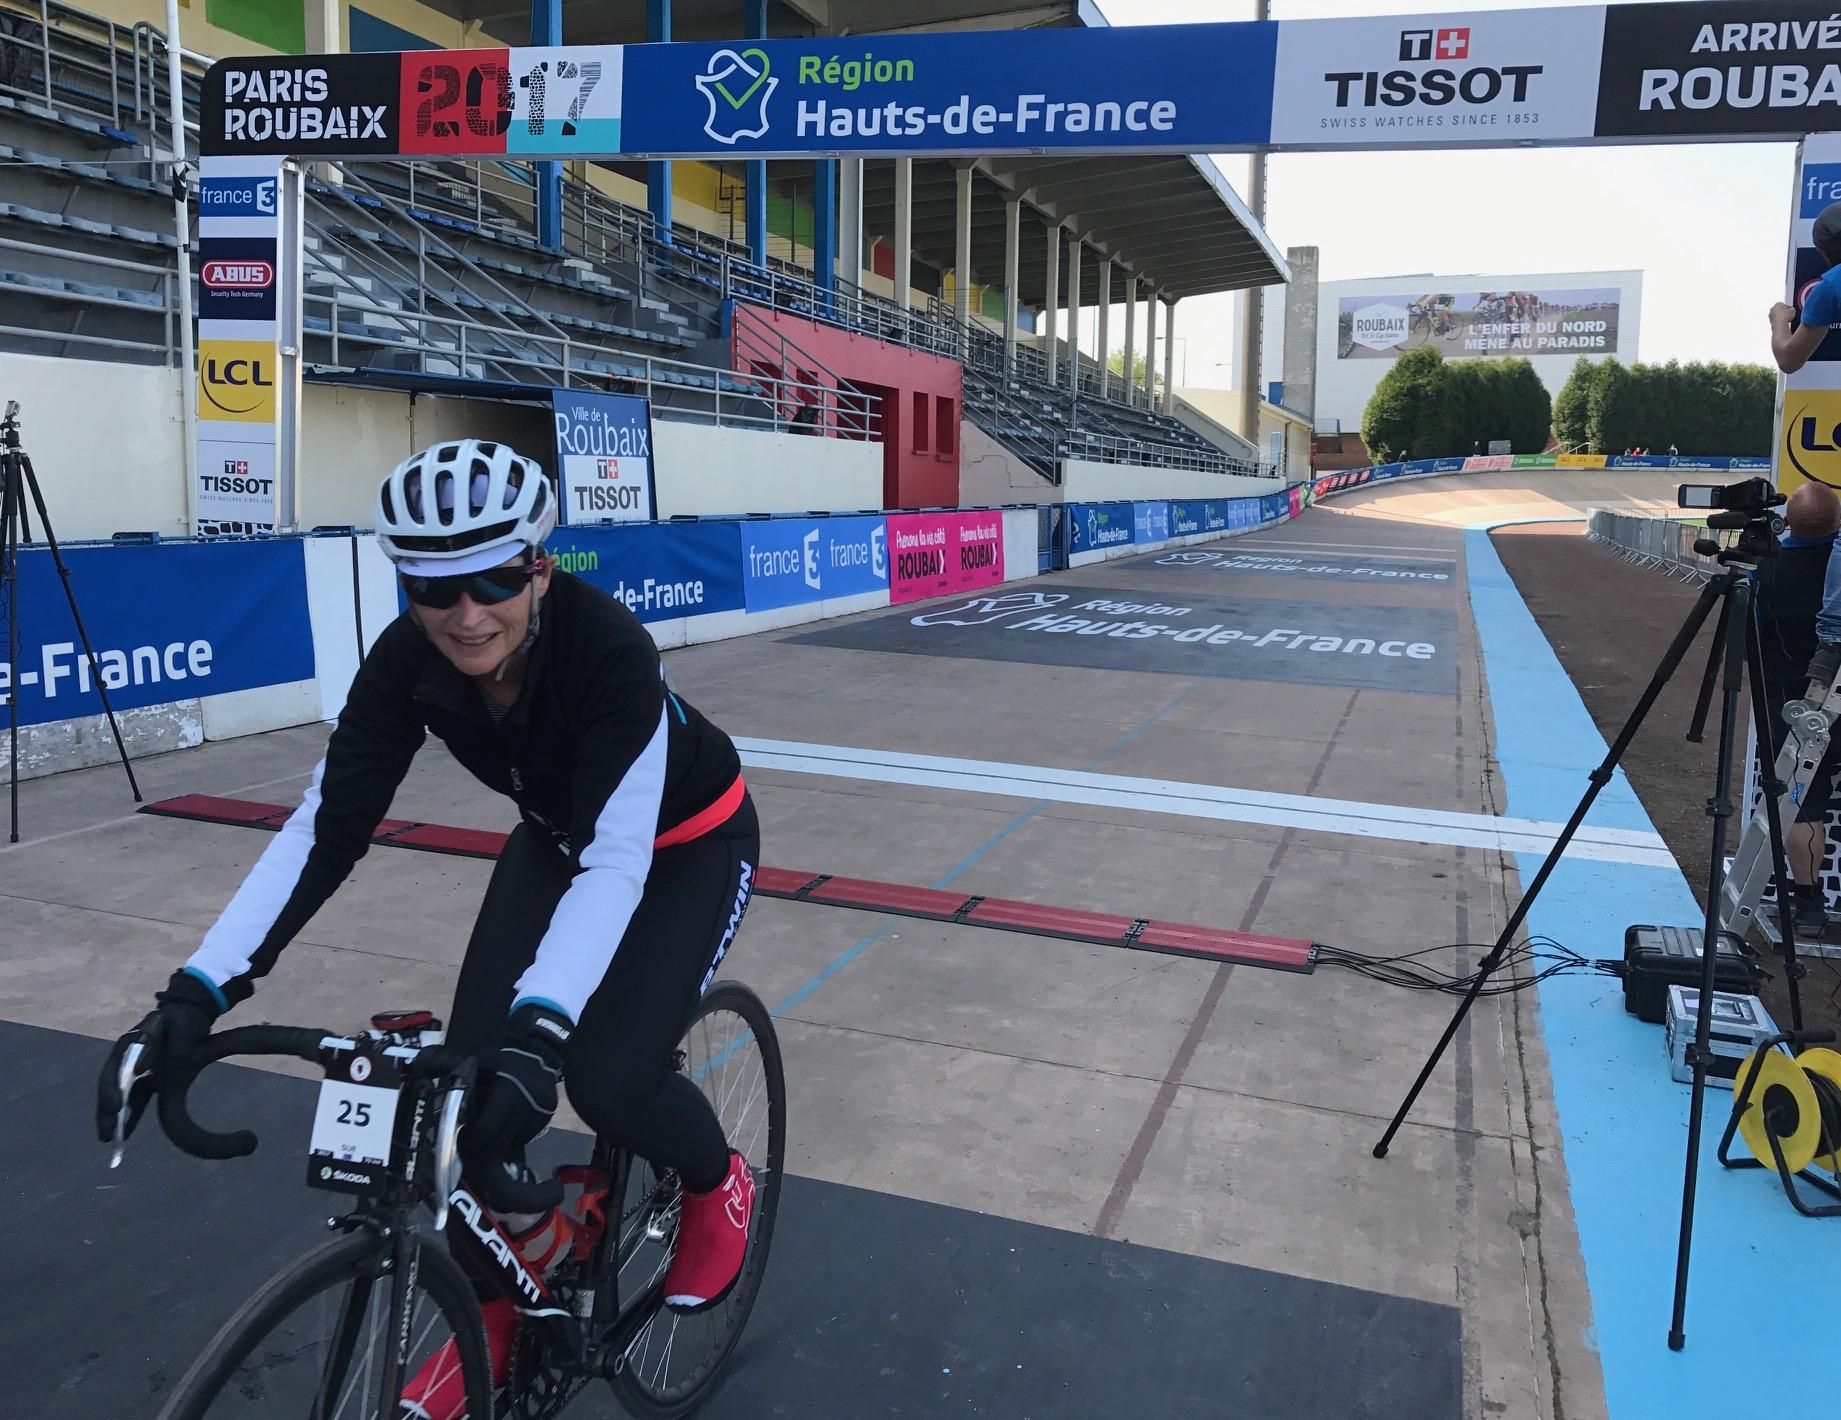 Paris Roubaix Cyclosportive 17 - Sue Tierney crosses the finishing line of the Roubaix Velodrome